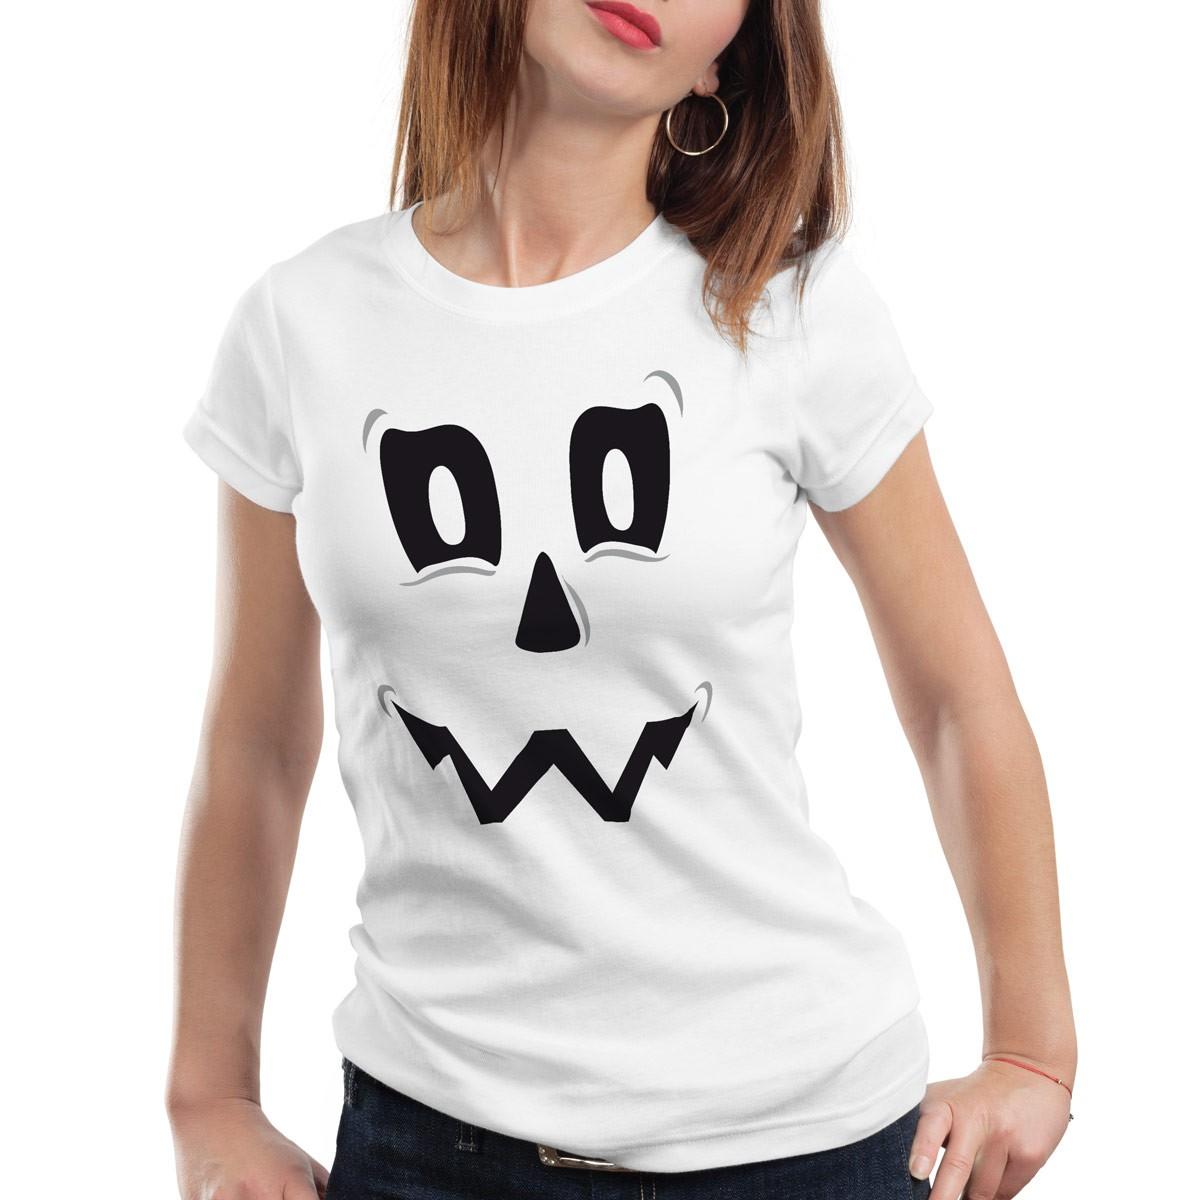 spuk geist halloween damen t shirt fasching kost m k rbis kopf party funshirt ebay. Black Bedroom Furniture Sets. Home Design Ideas